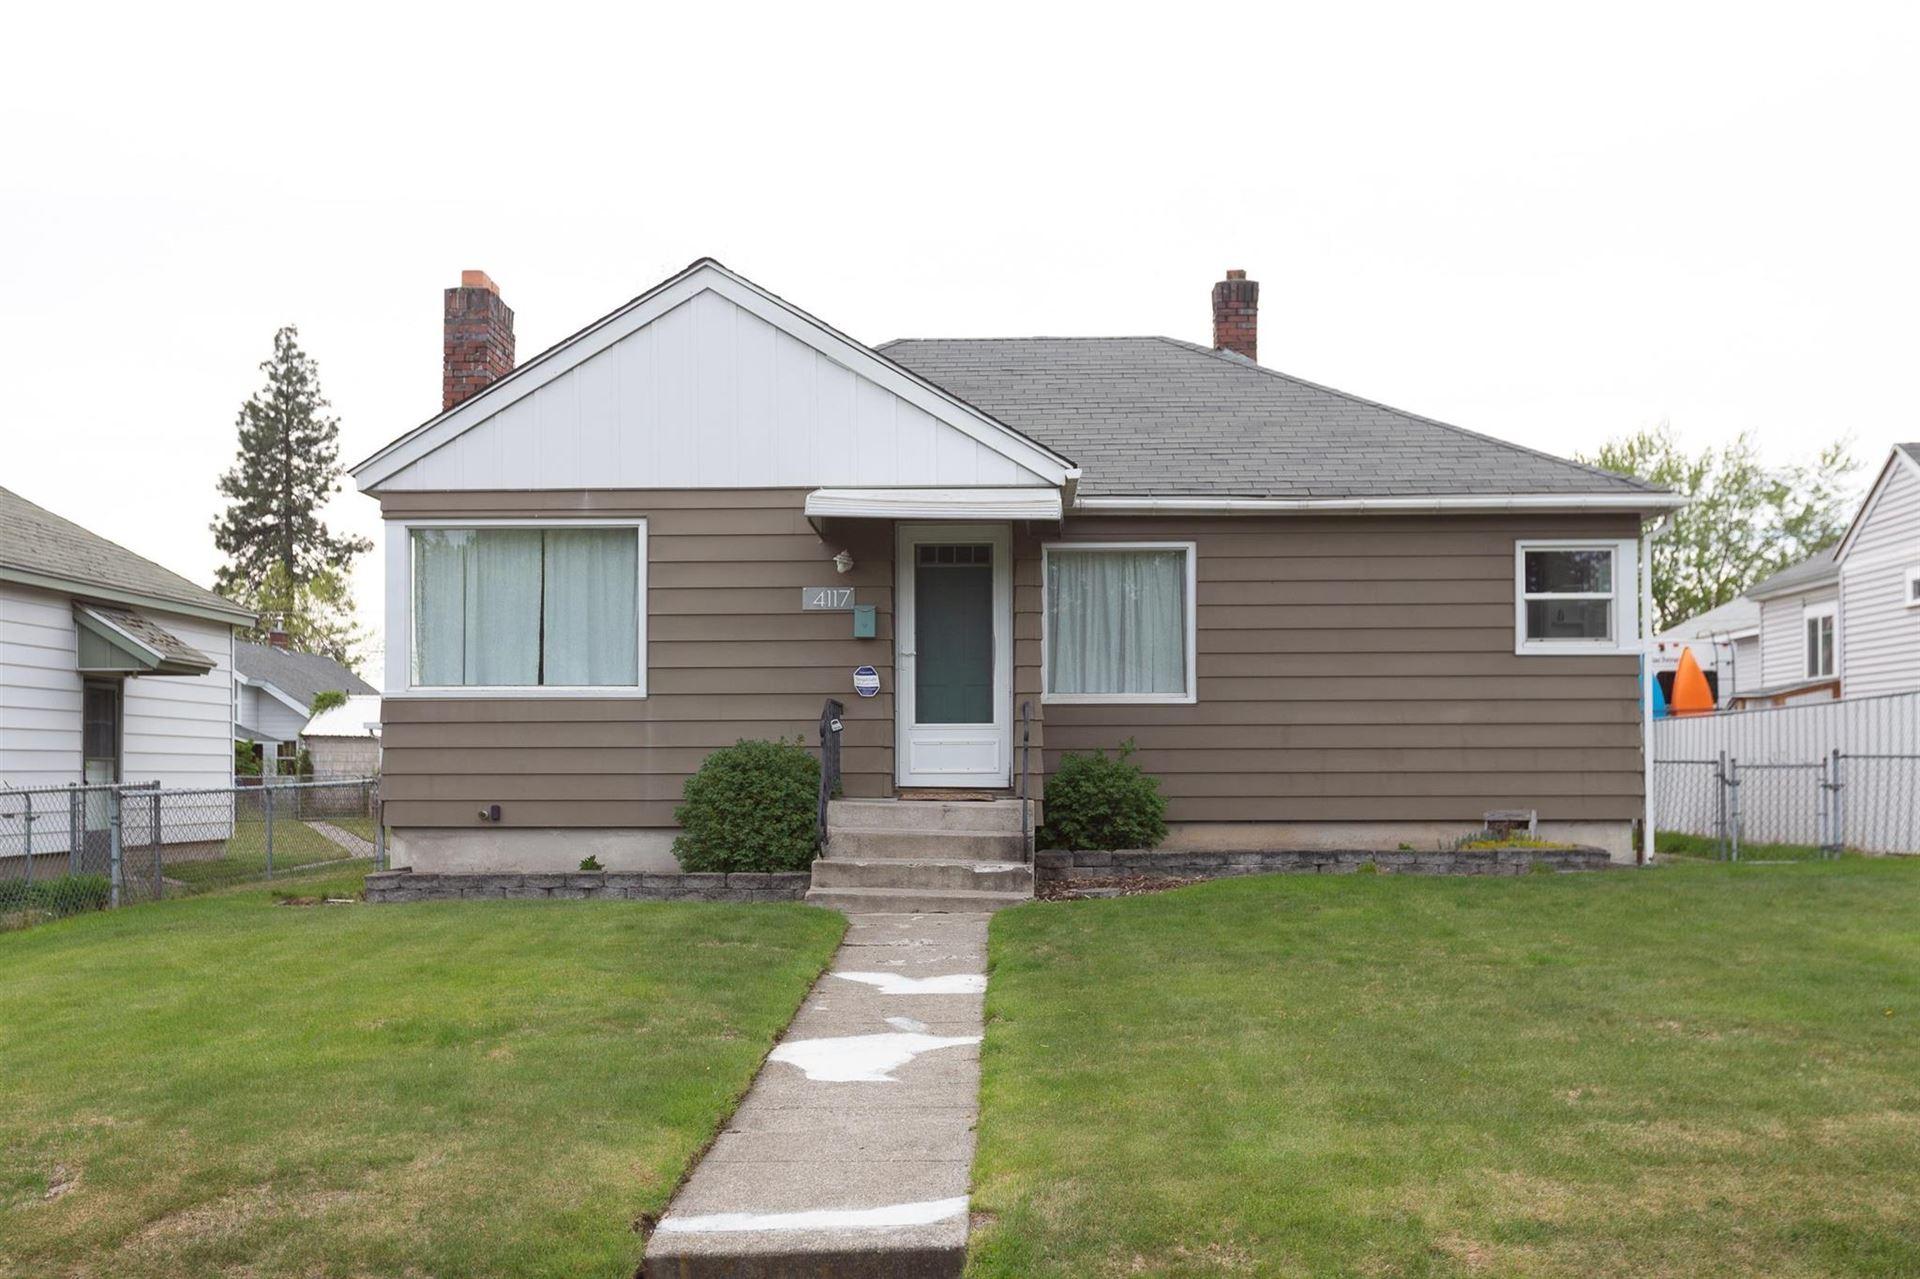 4117 N Washington St, Spokane, WA 99205 - #: 202115091